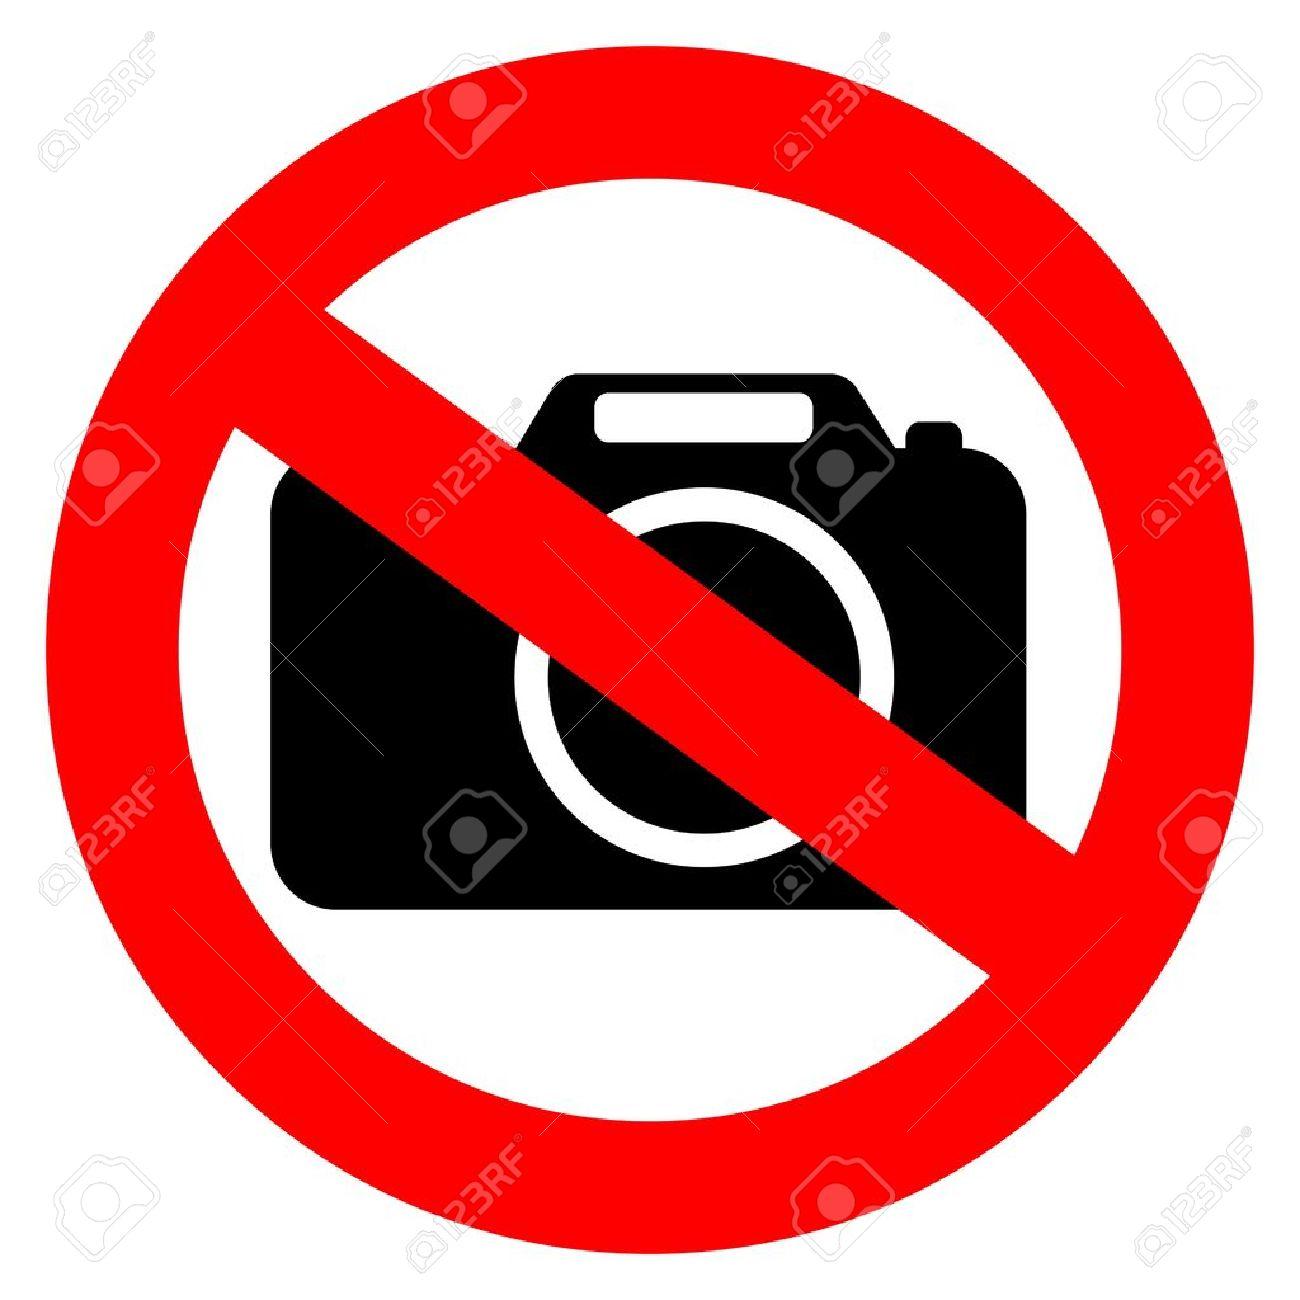 No photo camera sign Stock Vector - 14643679